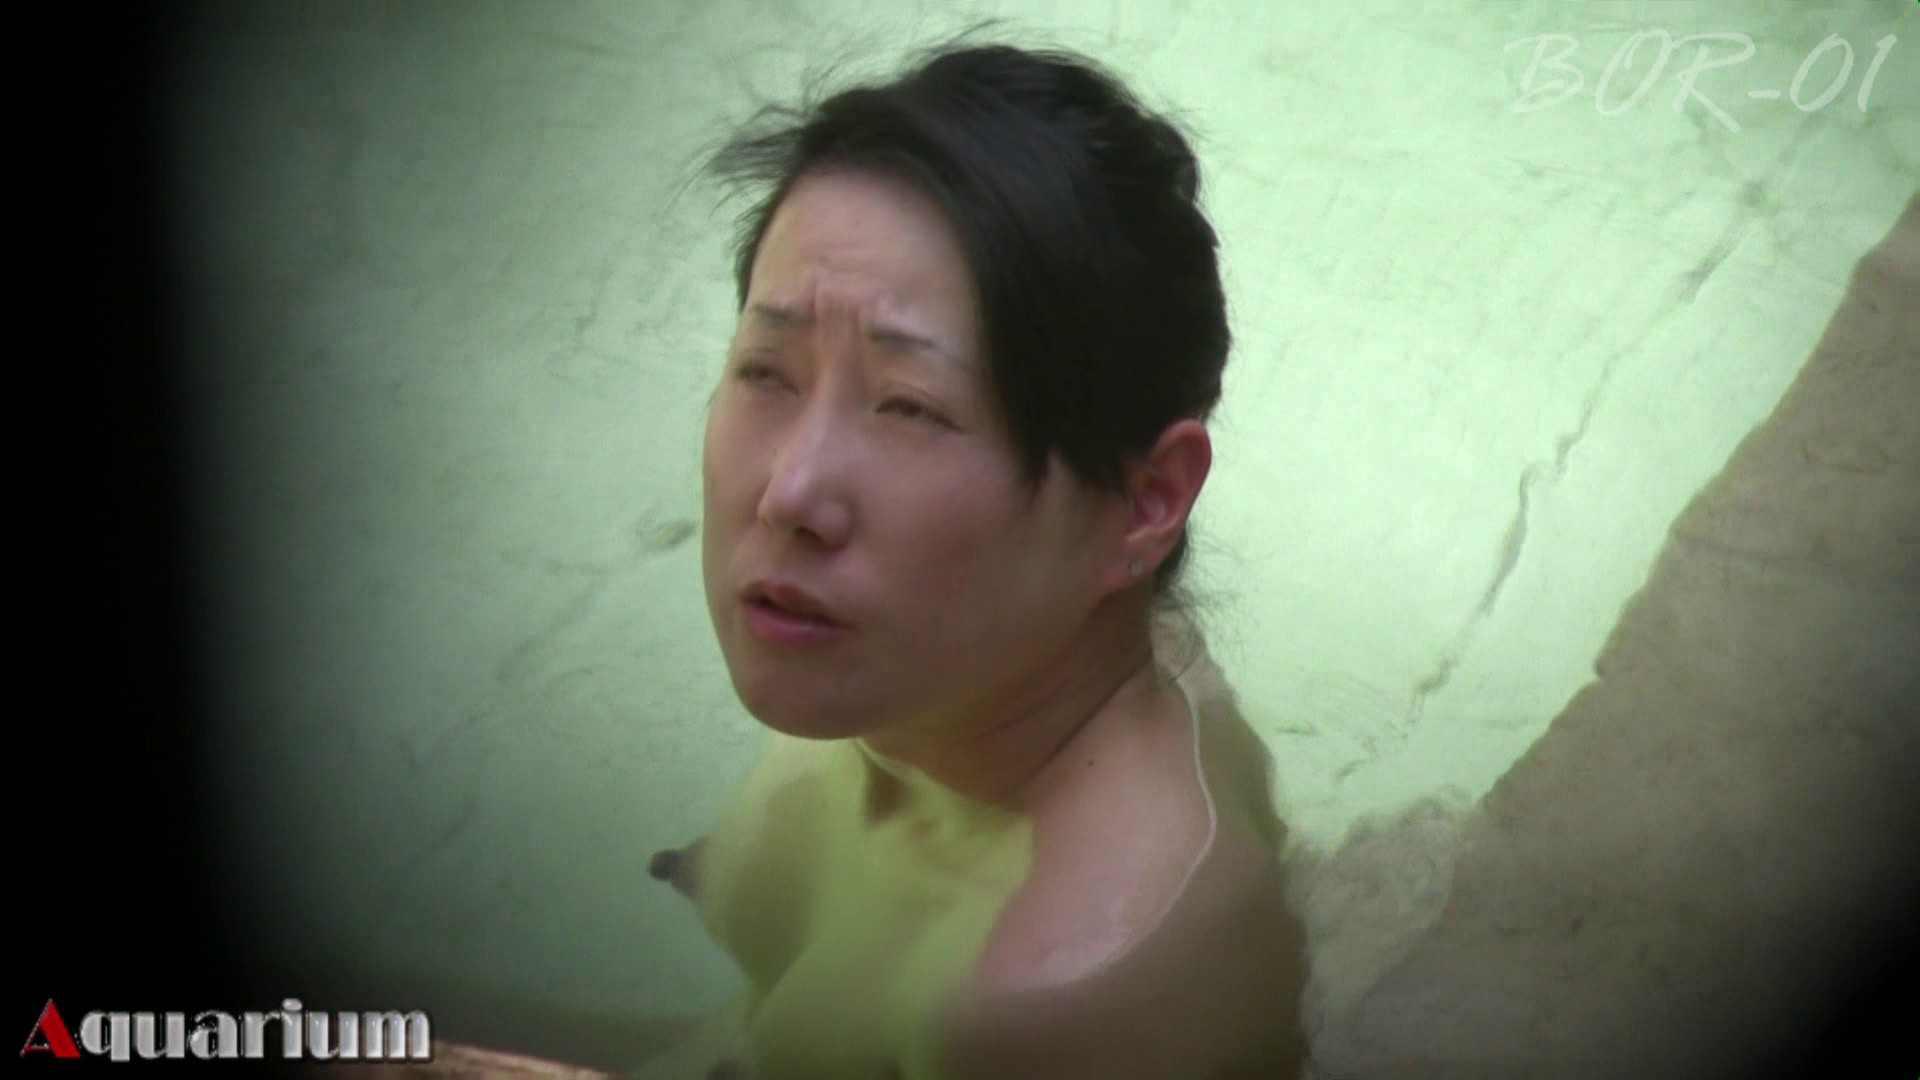 Aquaな露天風呂Vol.461 エッチな盗撮 AV無料動画キャプチャ 108pic 35